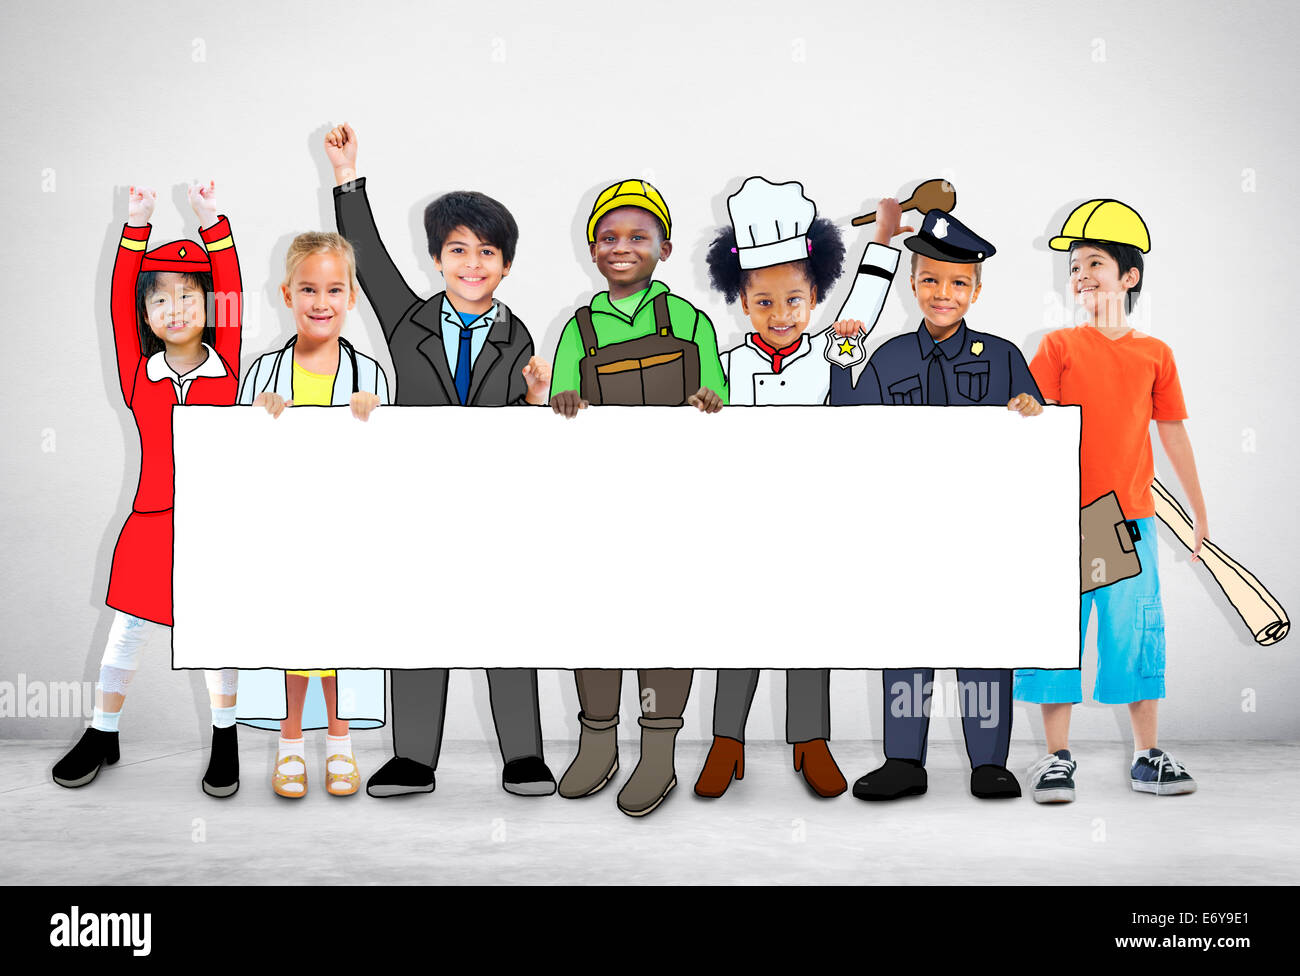 Children Wearing Future Job Uniforms - Stock Image